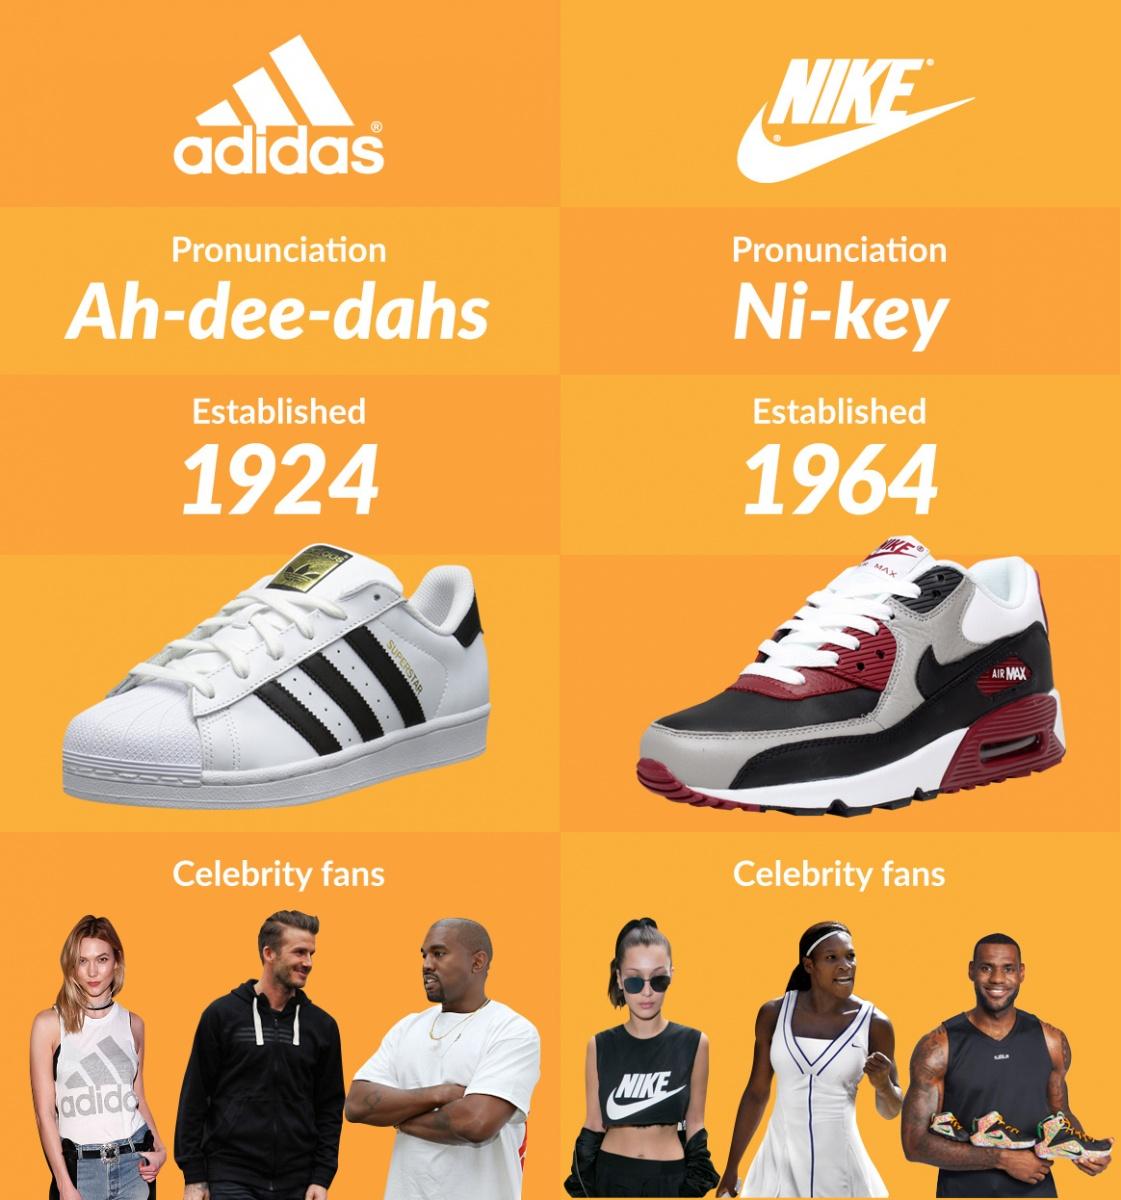 0506-nike-v-adidas